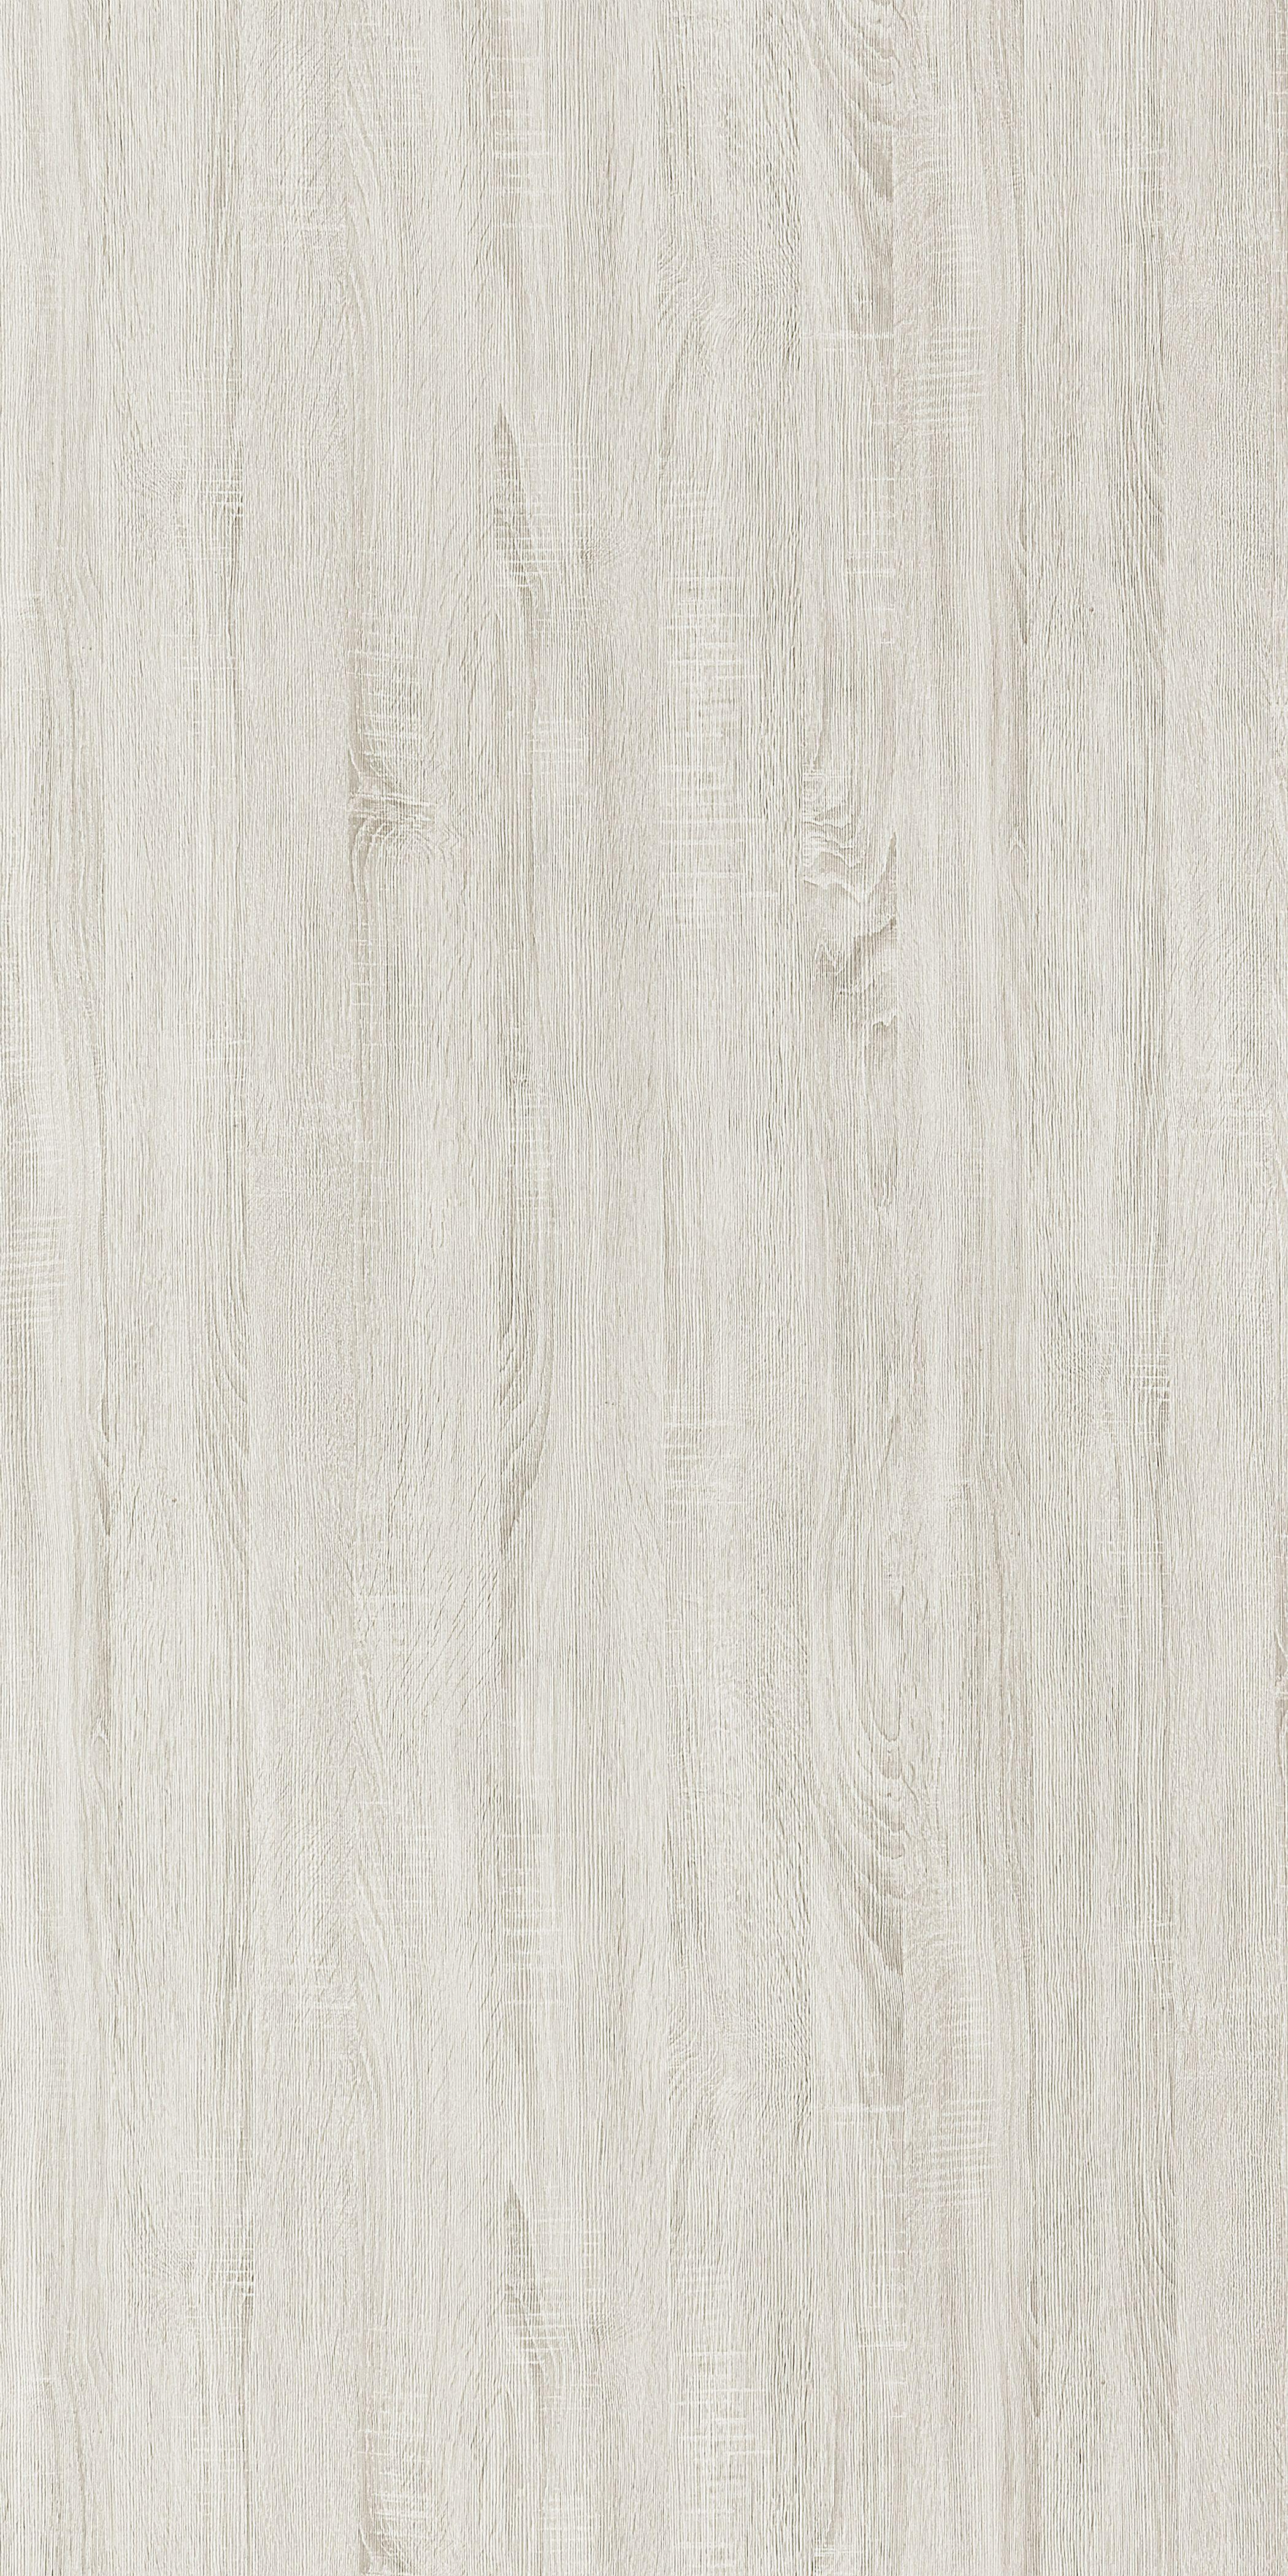 Wood Flooring Marble Tiles EDL